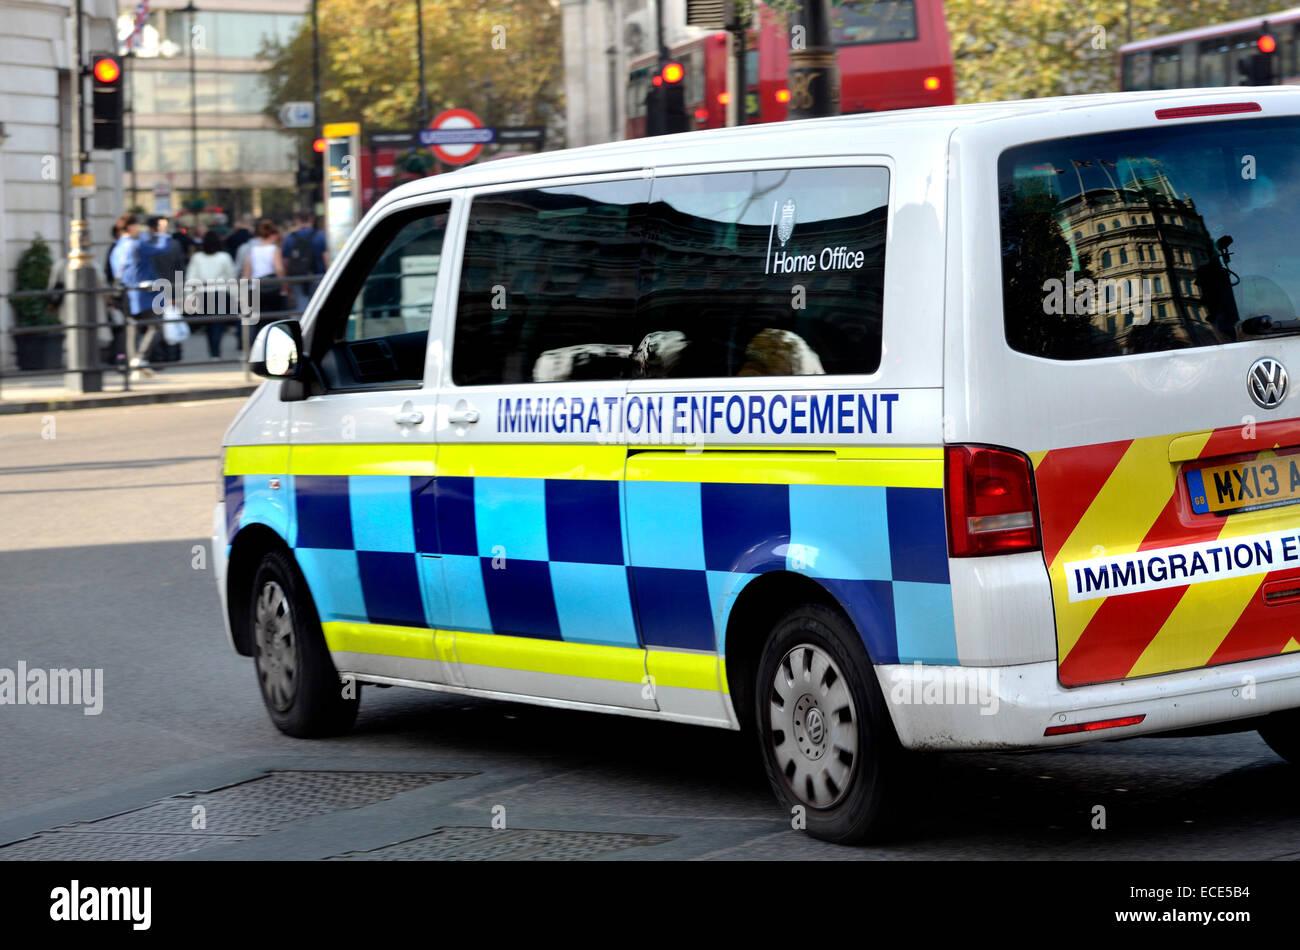 Immigration Enforcement  >> London England Uk Home Office Immigration Enforcement Van Stock